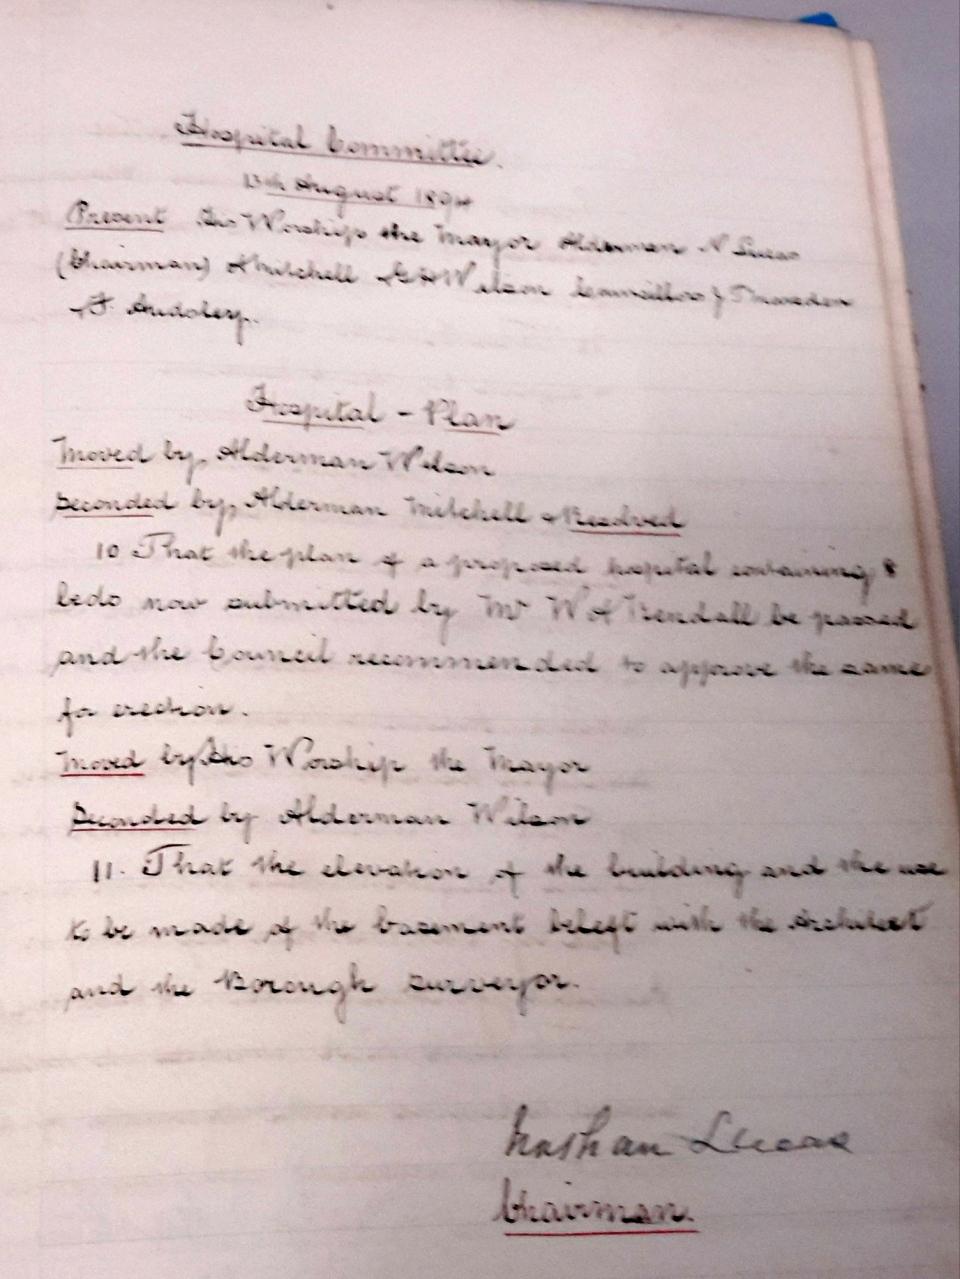 5) 13th Aug 1894